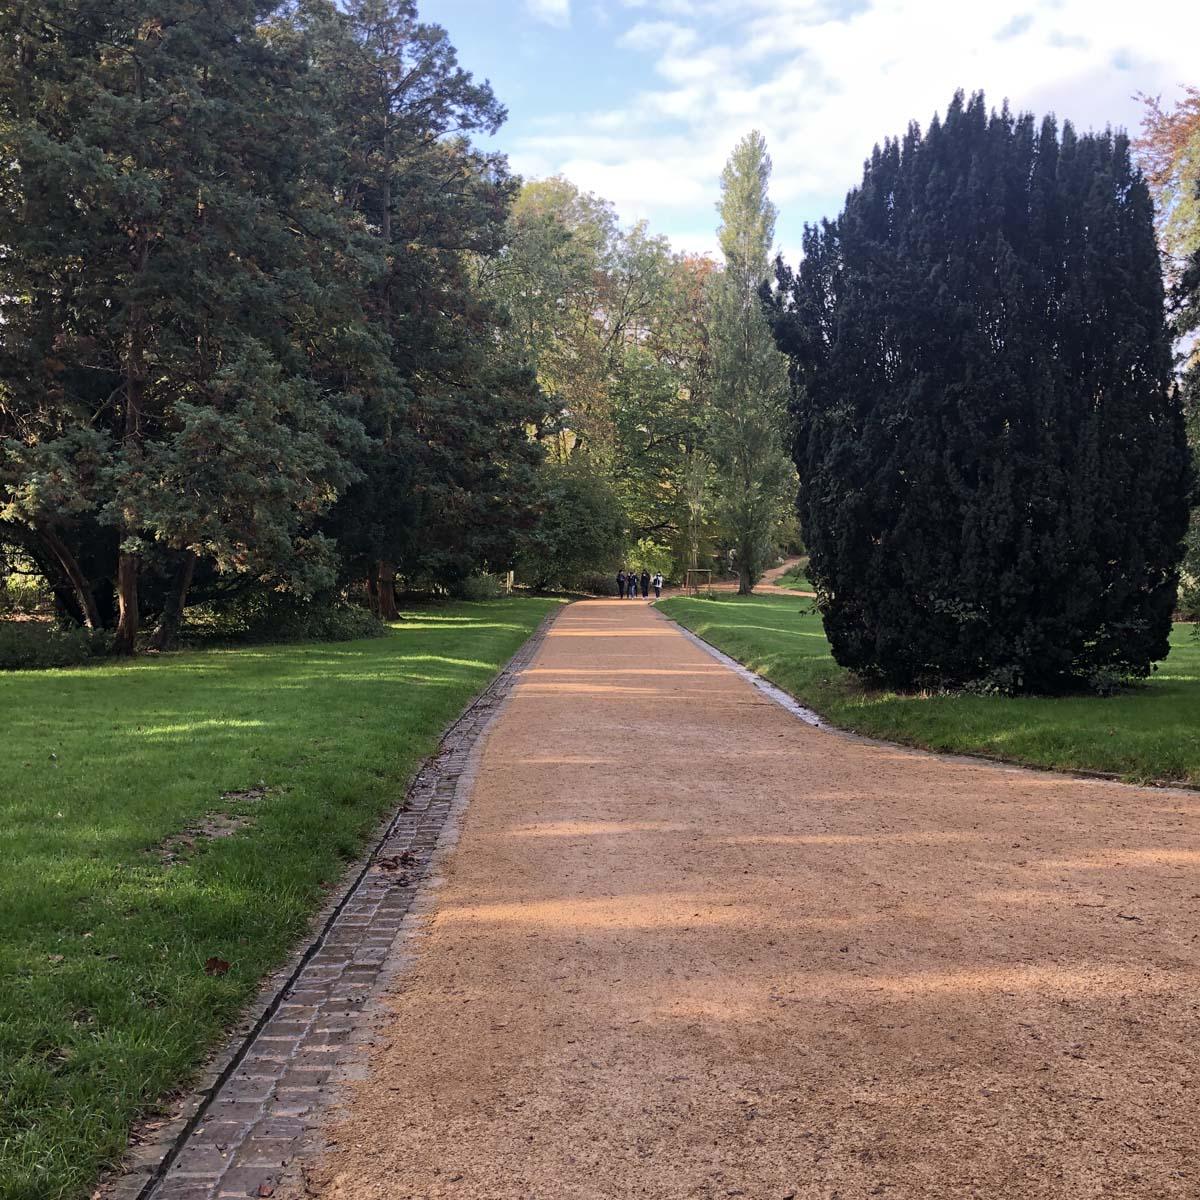 Green Road realisatie te Anderlecht, Astridpark - Ochros